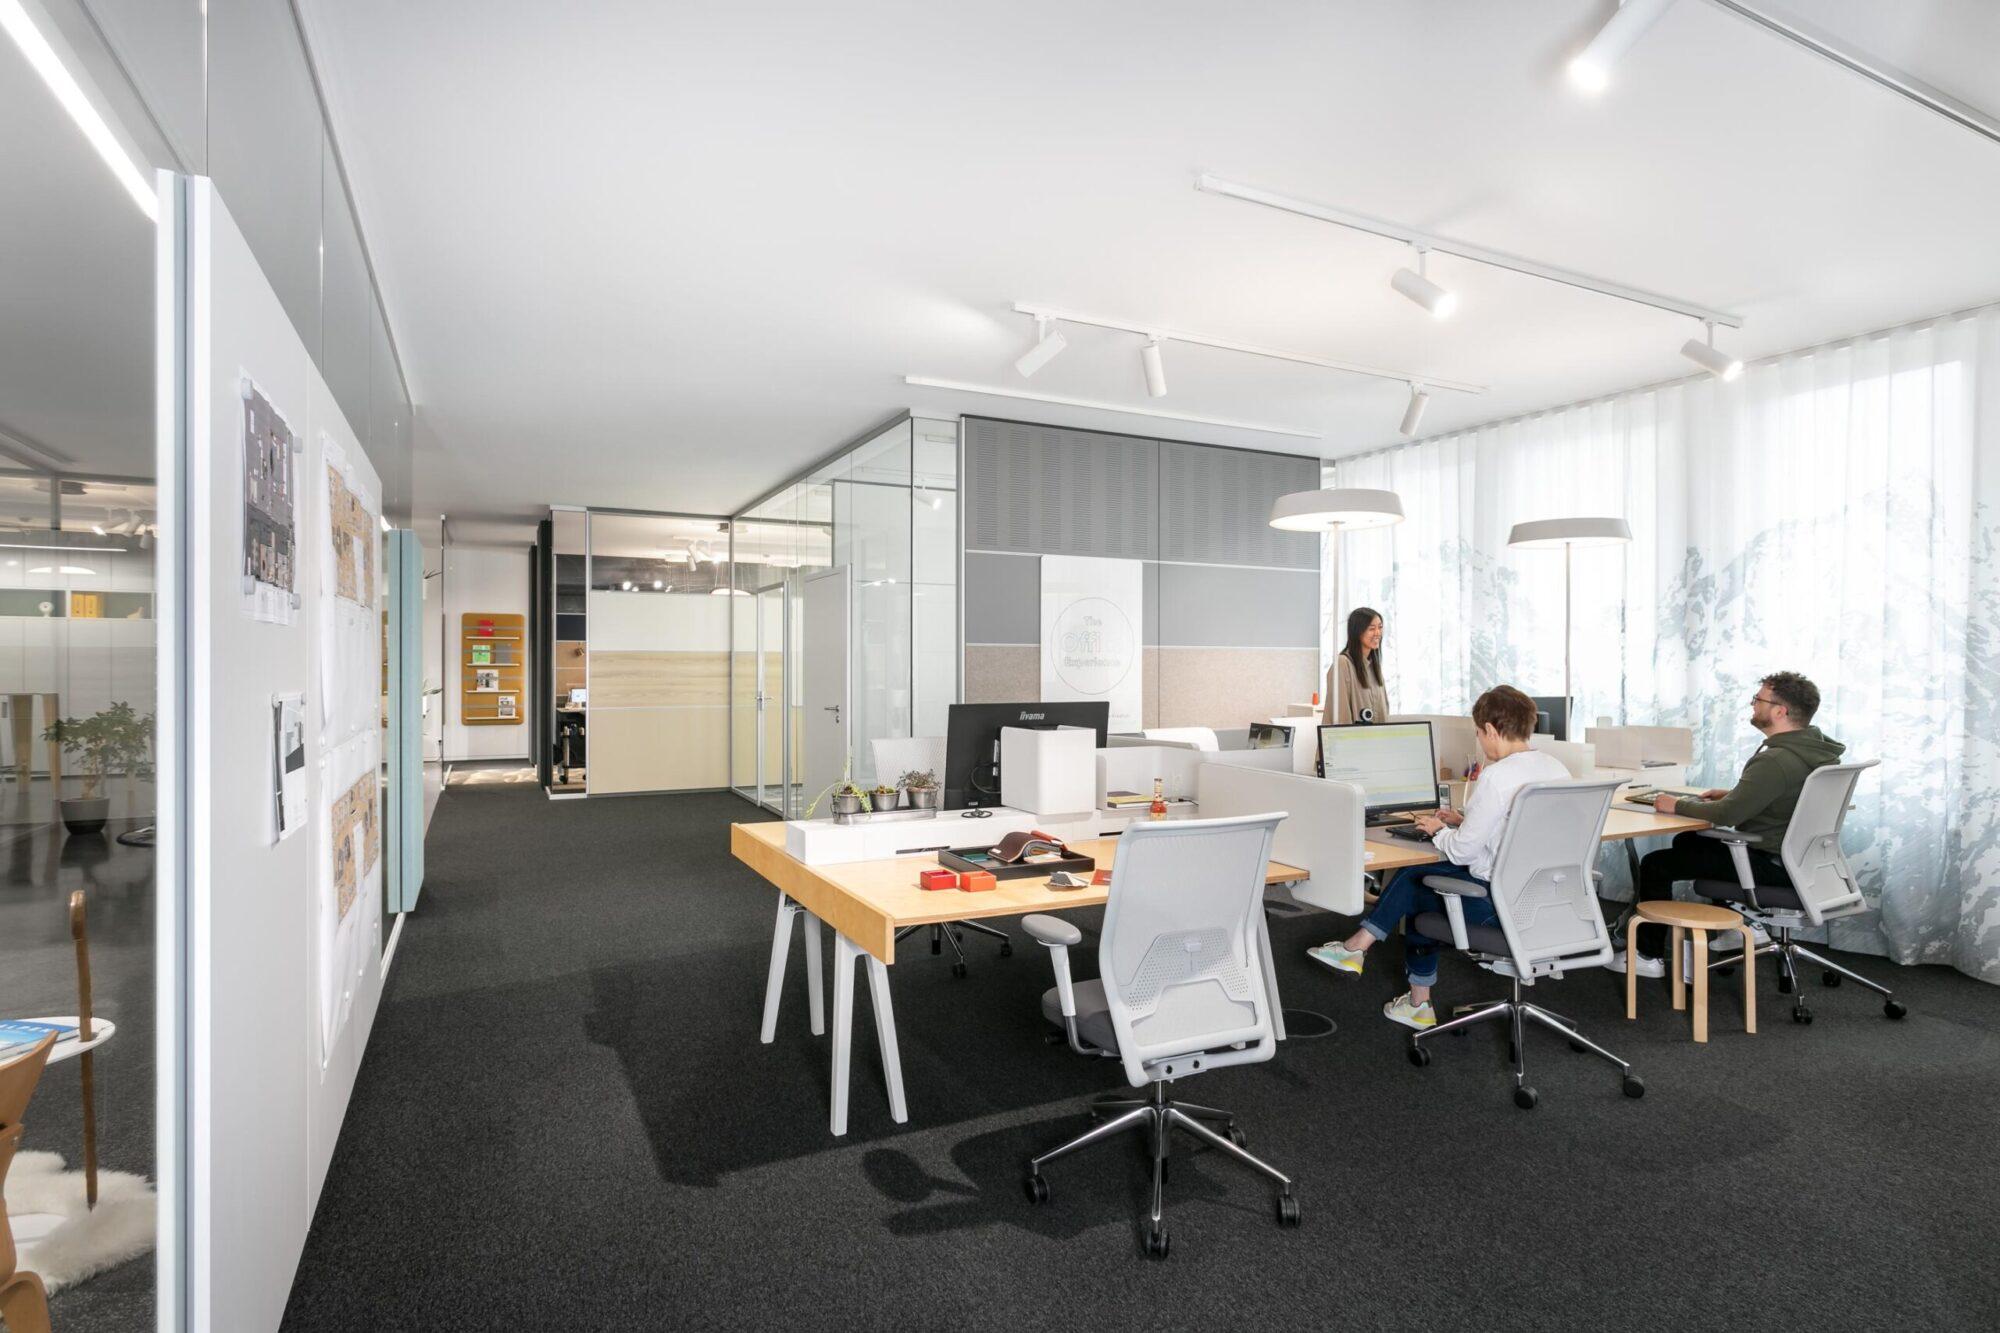 Kreative Interaktionsräume statt starrer Büroflächen